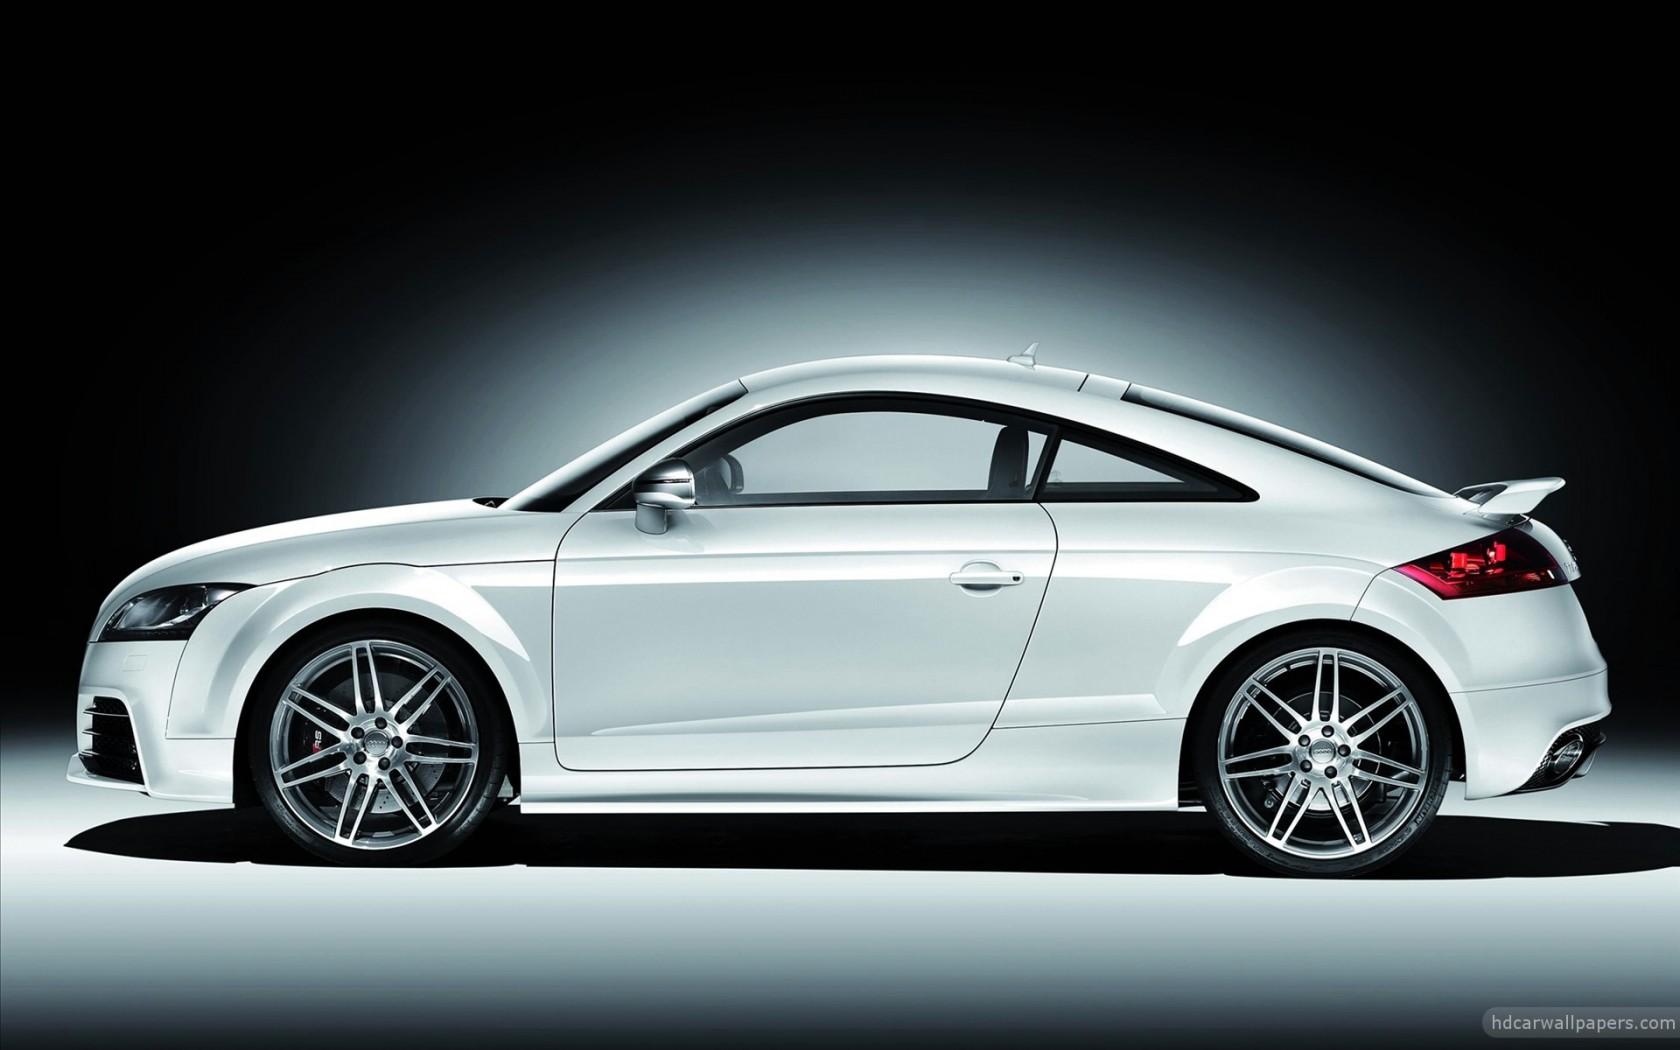 2012 Audi TT RS 3 Wallpaper HD Car Wallpapers 1680x1050